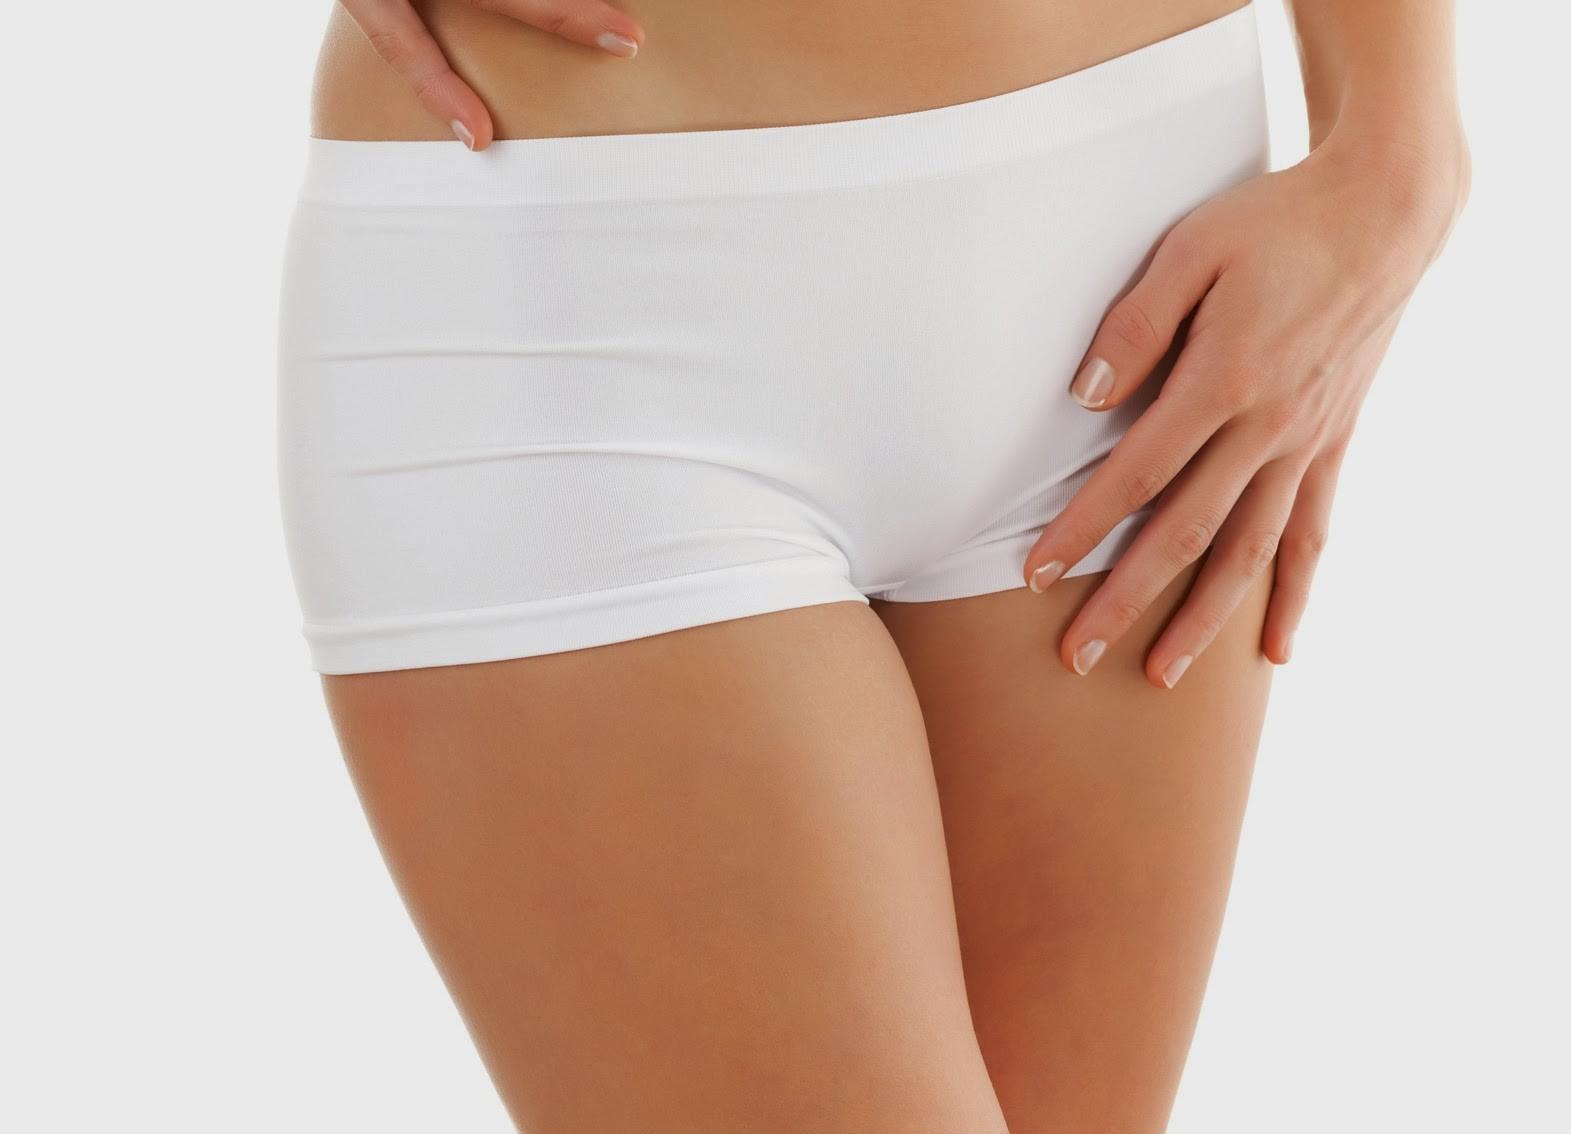 vajina daraltma operasyonu